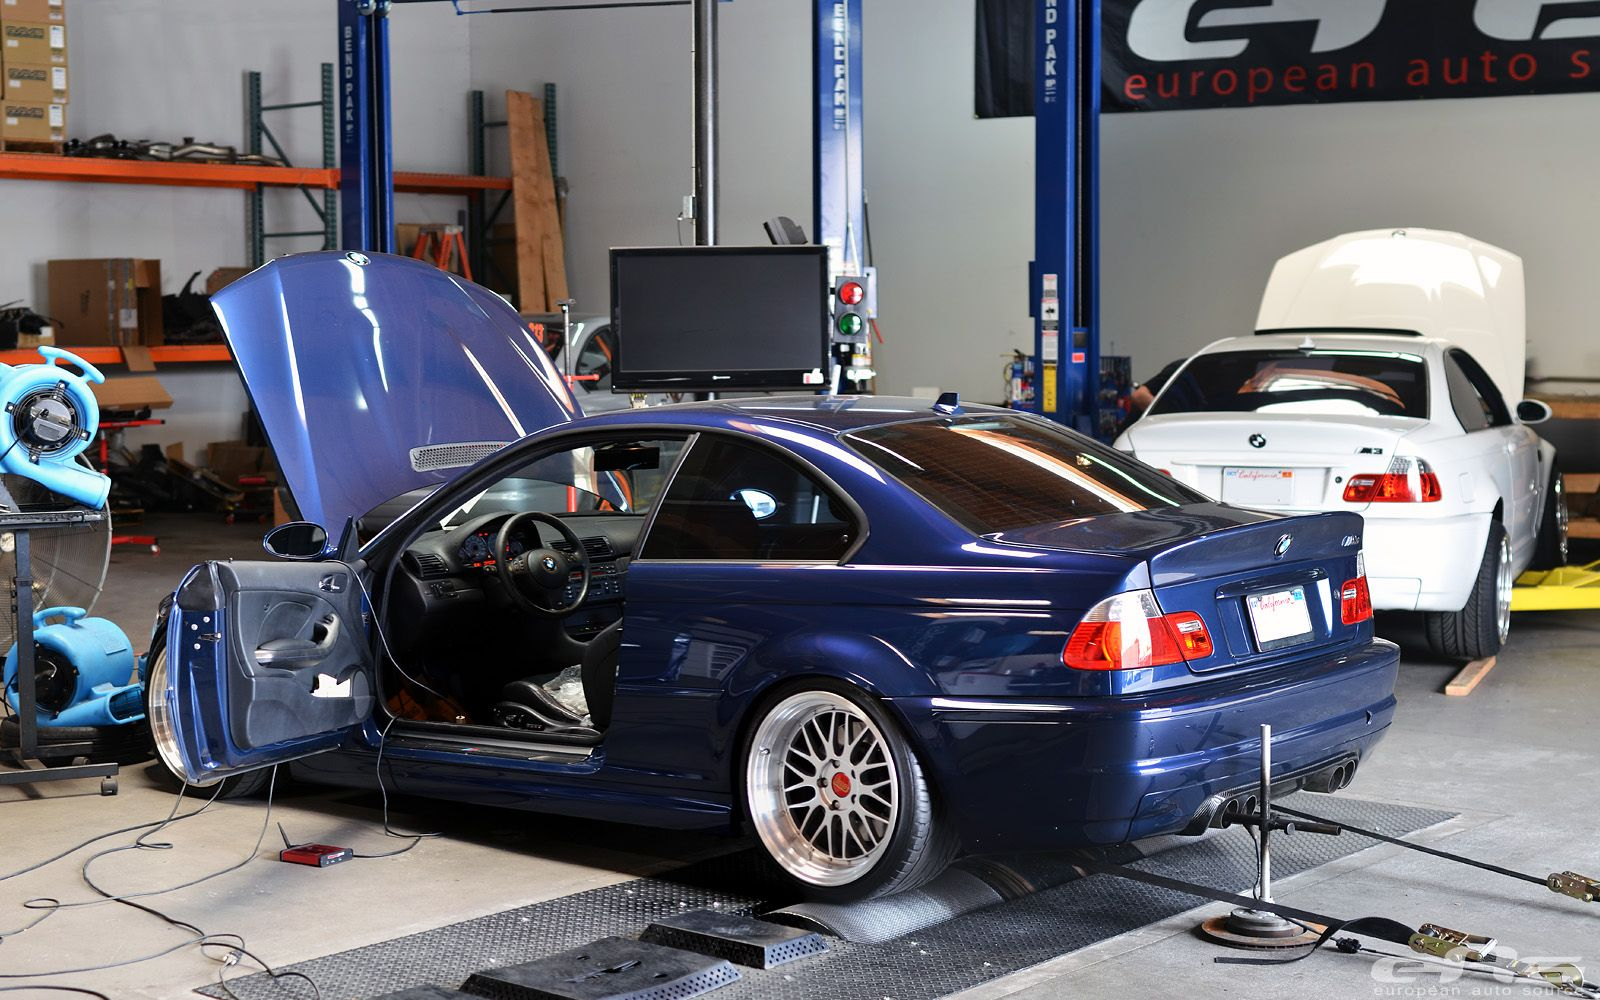 BMW Convertible bmw e46 supercharger for sale 2004 BMW M3 - DINAN Supercharged | ///M3 Mods | Pinterest | BMW M3 ...